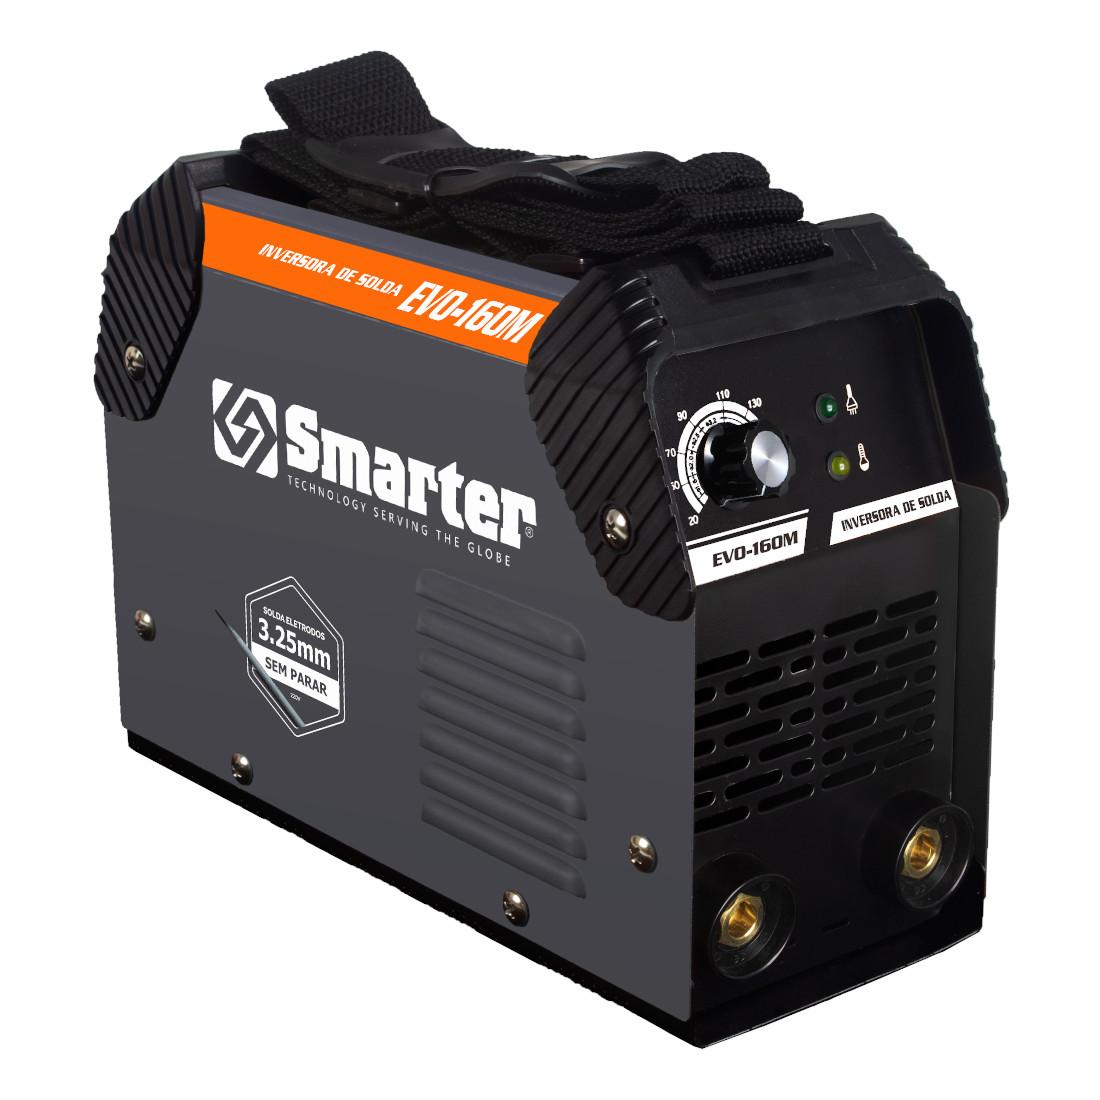 Máquina Inversora de Solda, Bivolt, SMARTER - EVO160M